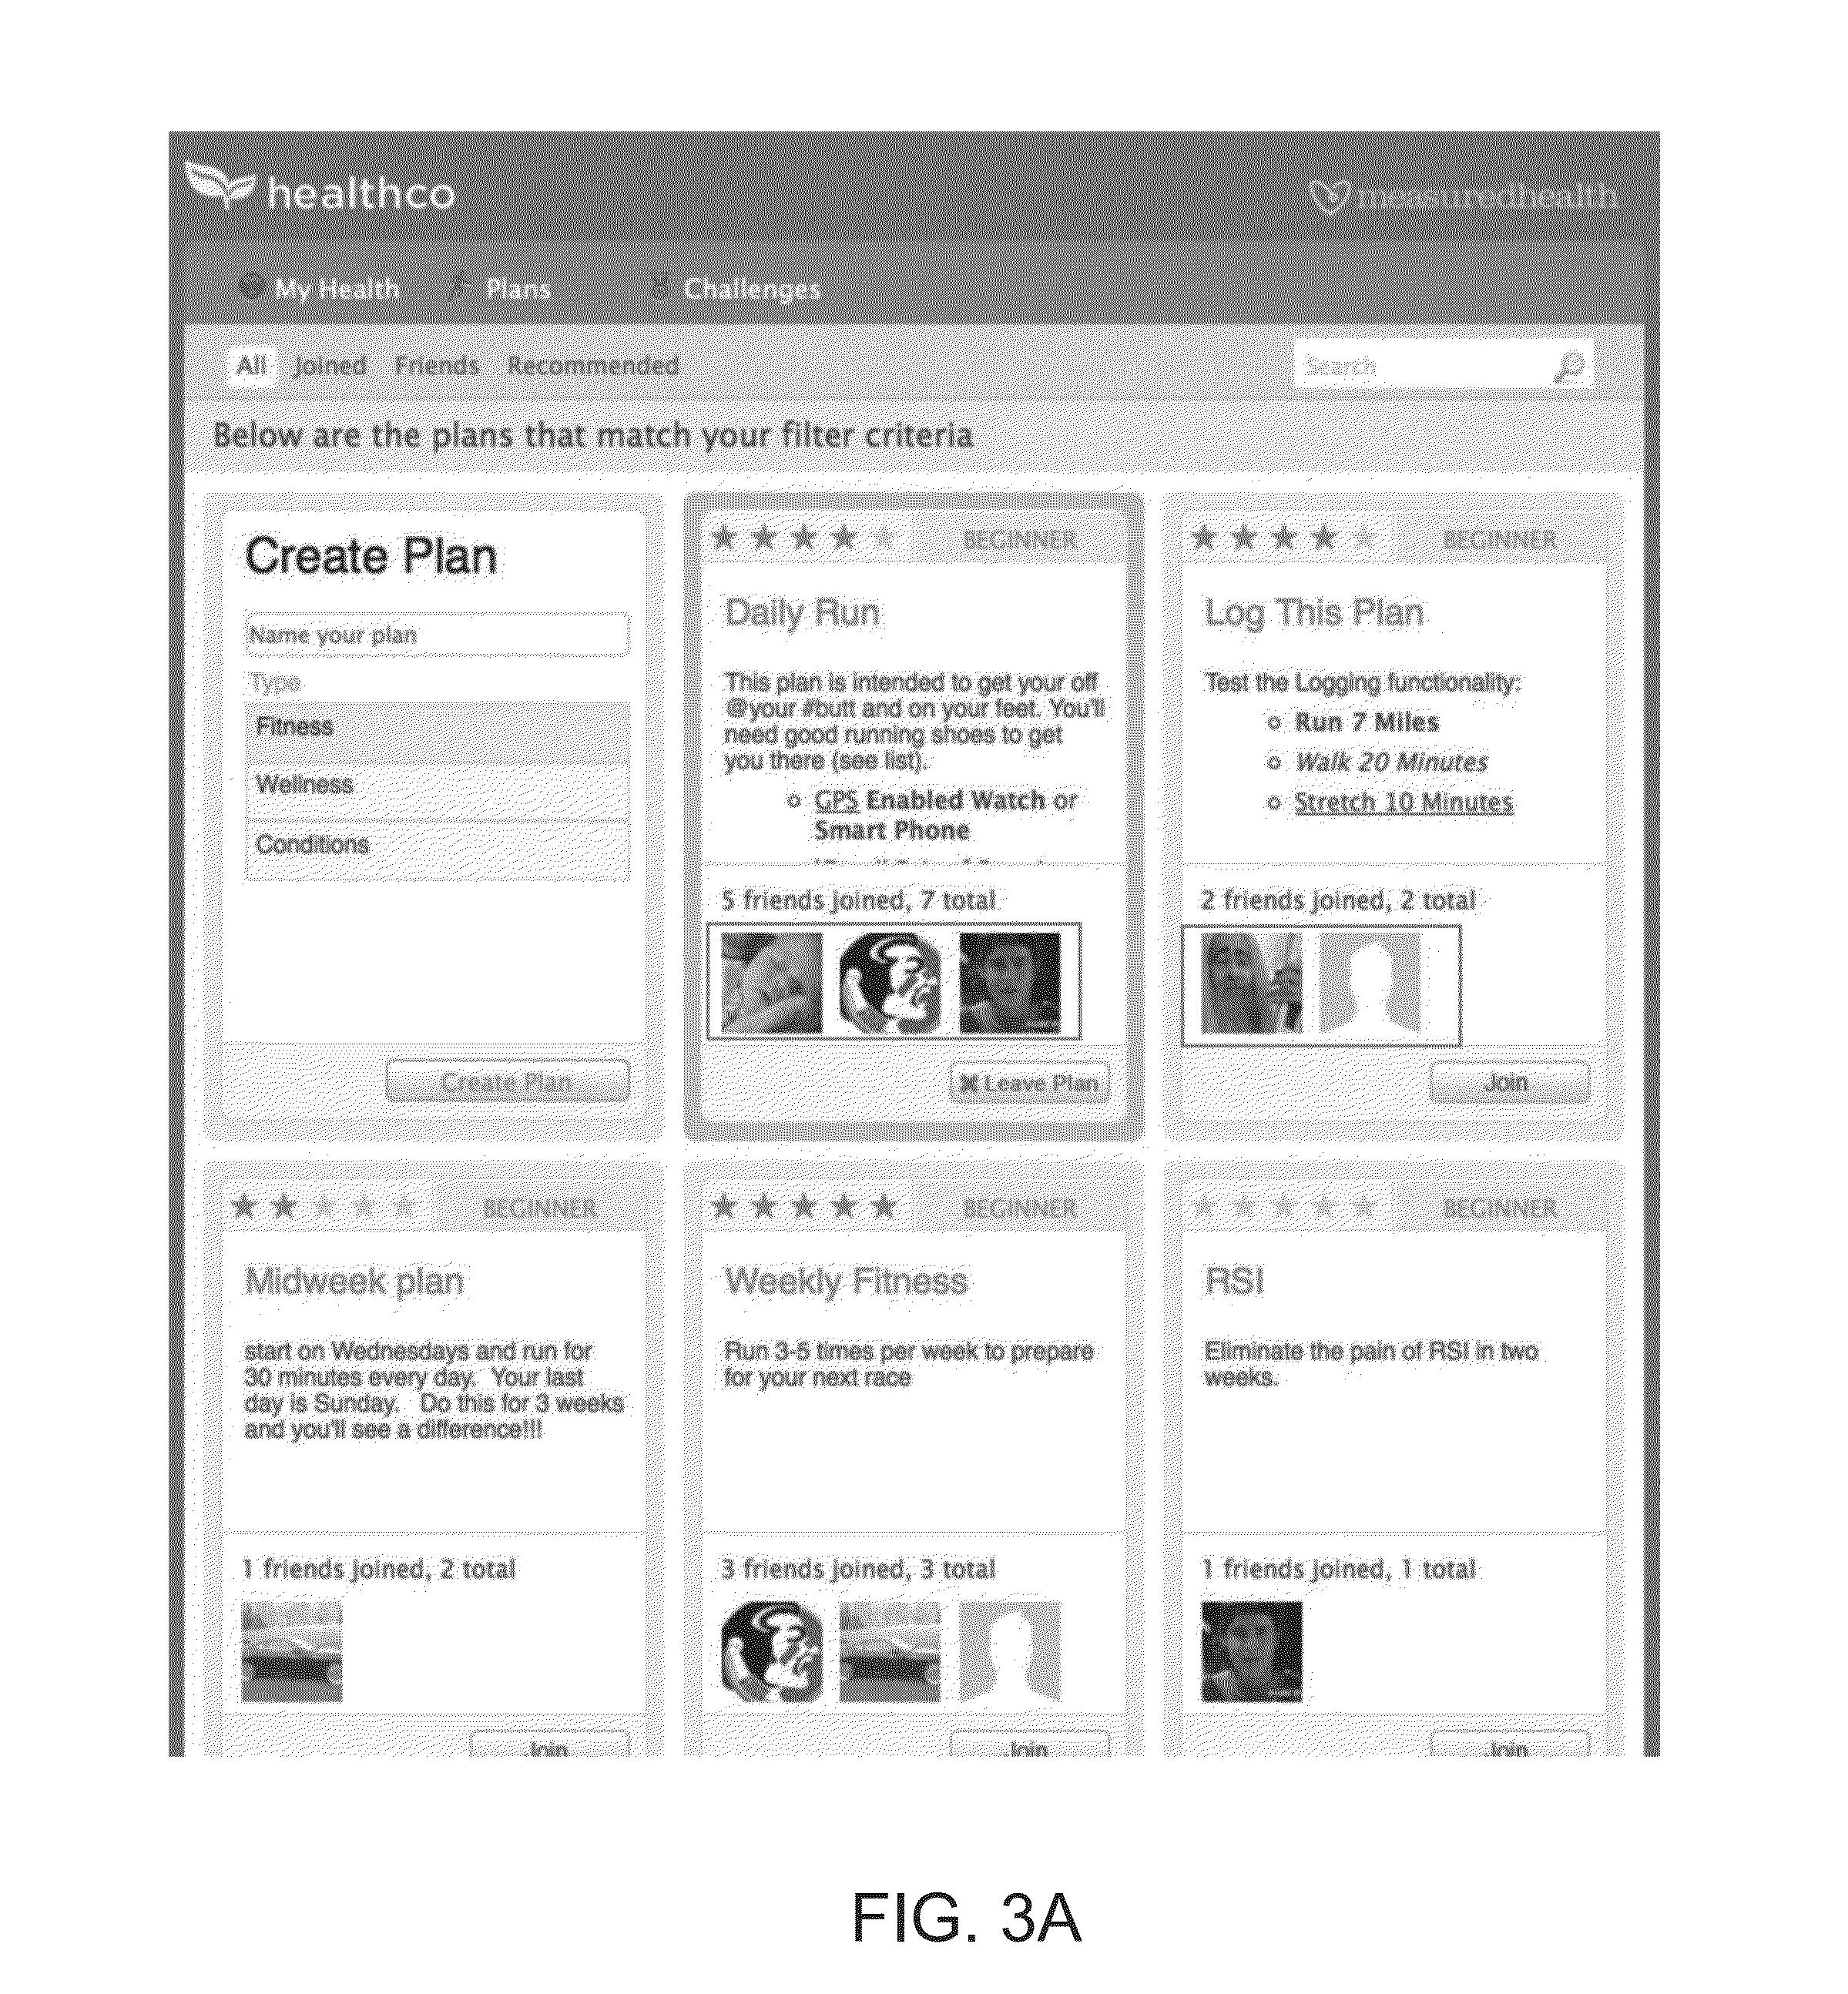 Patent US 8,784,209 B2